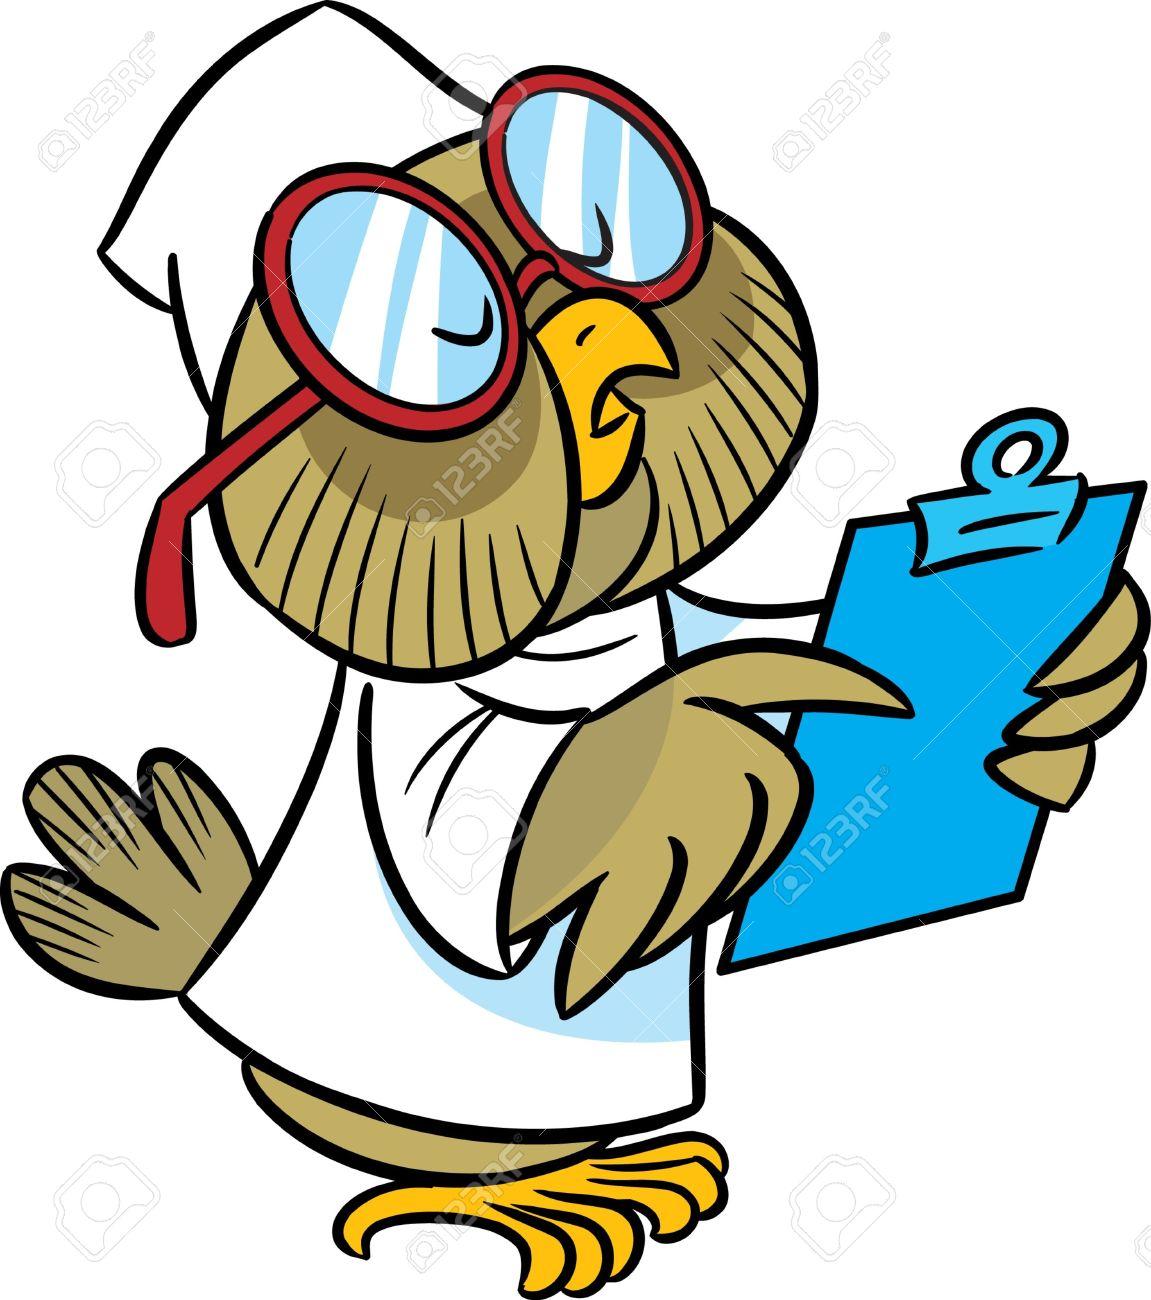 Doctor Bird clipart #6, Download drawings